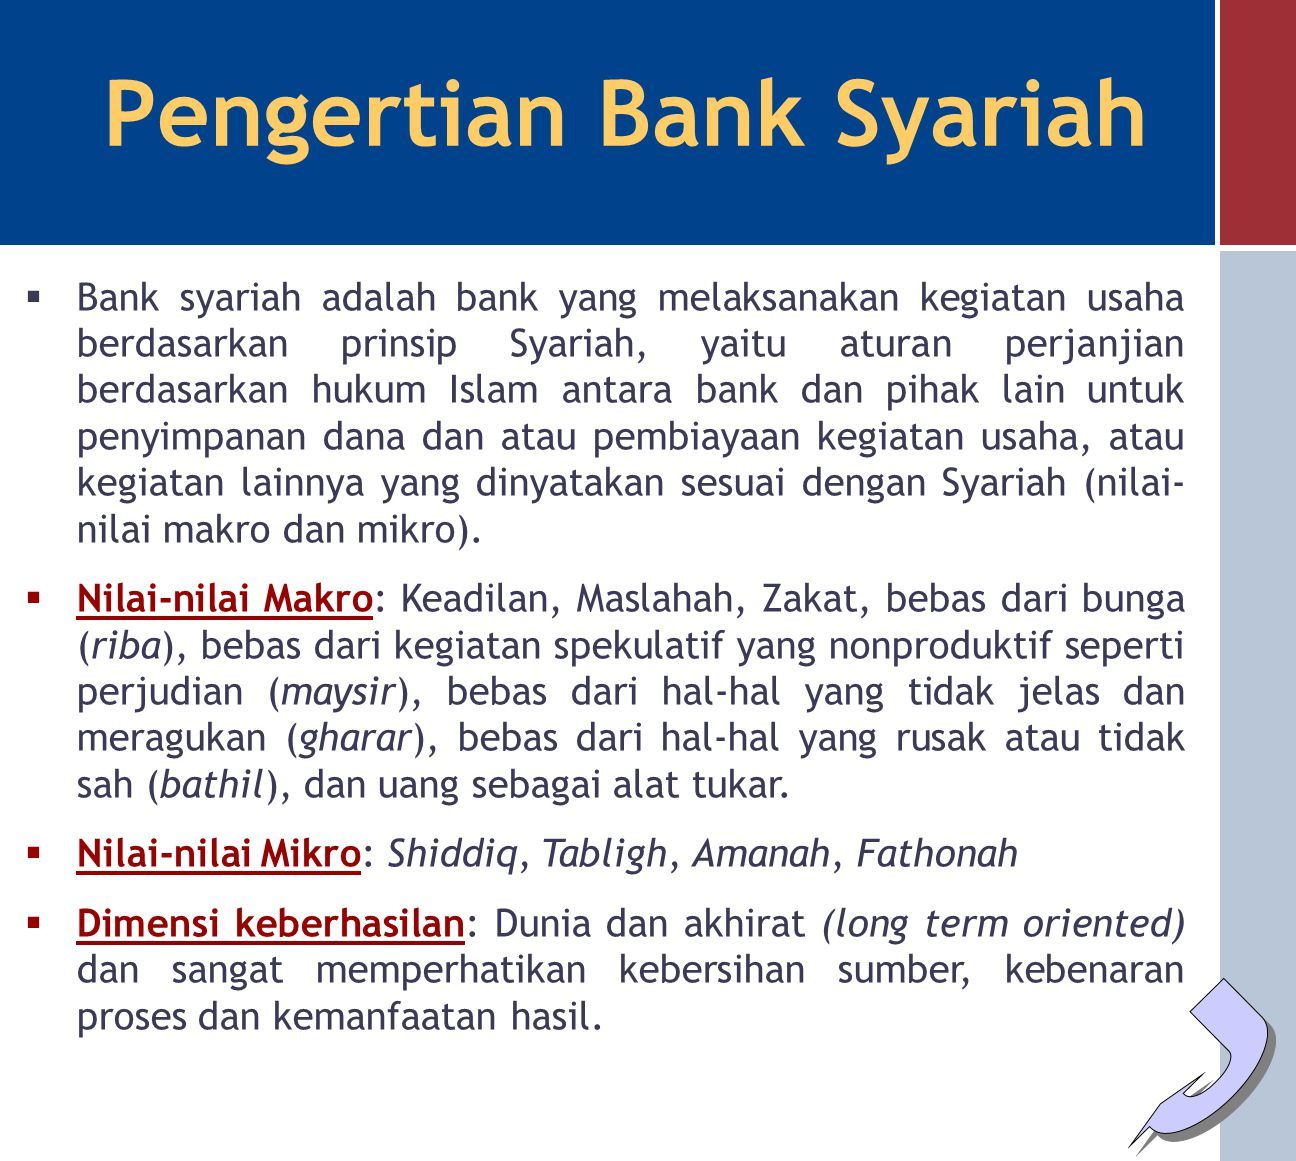 Pengertian Bank Syariah Ppt Download